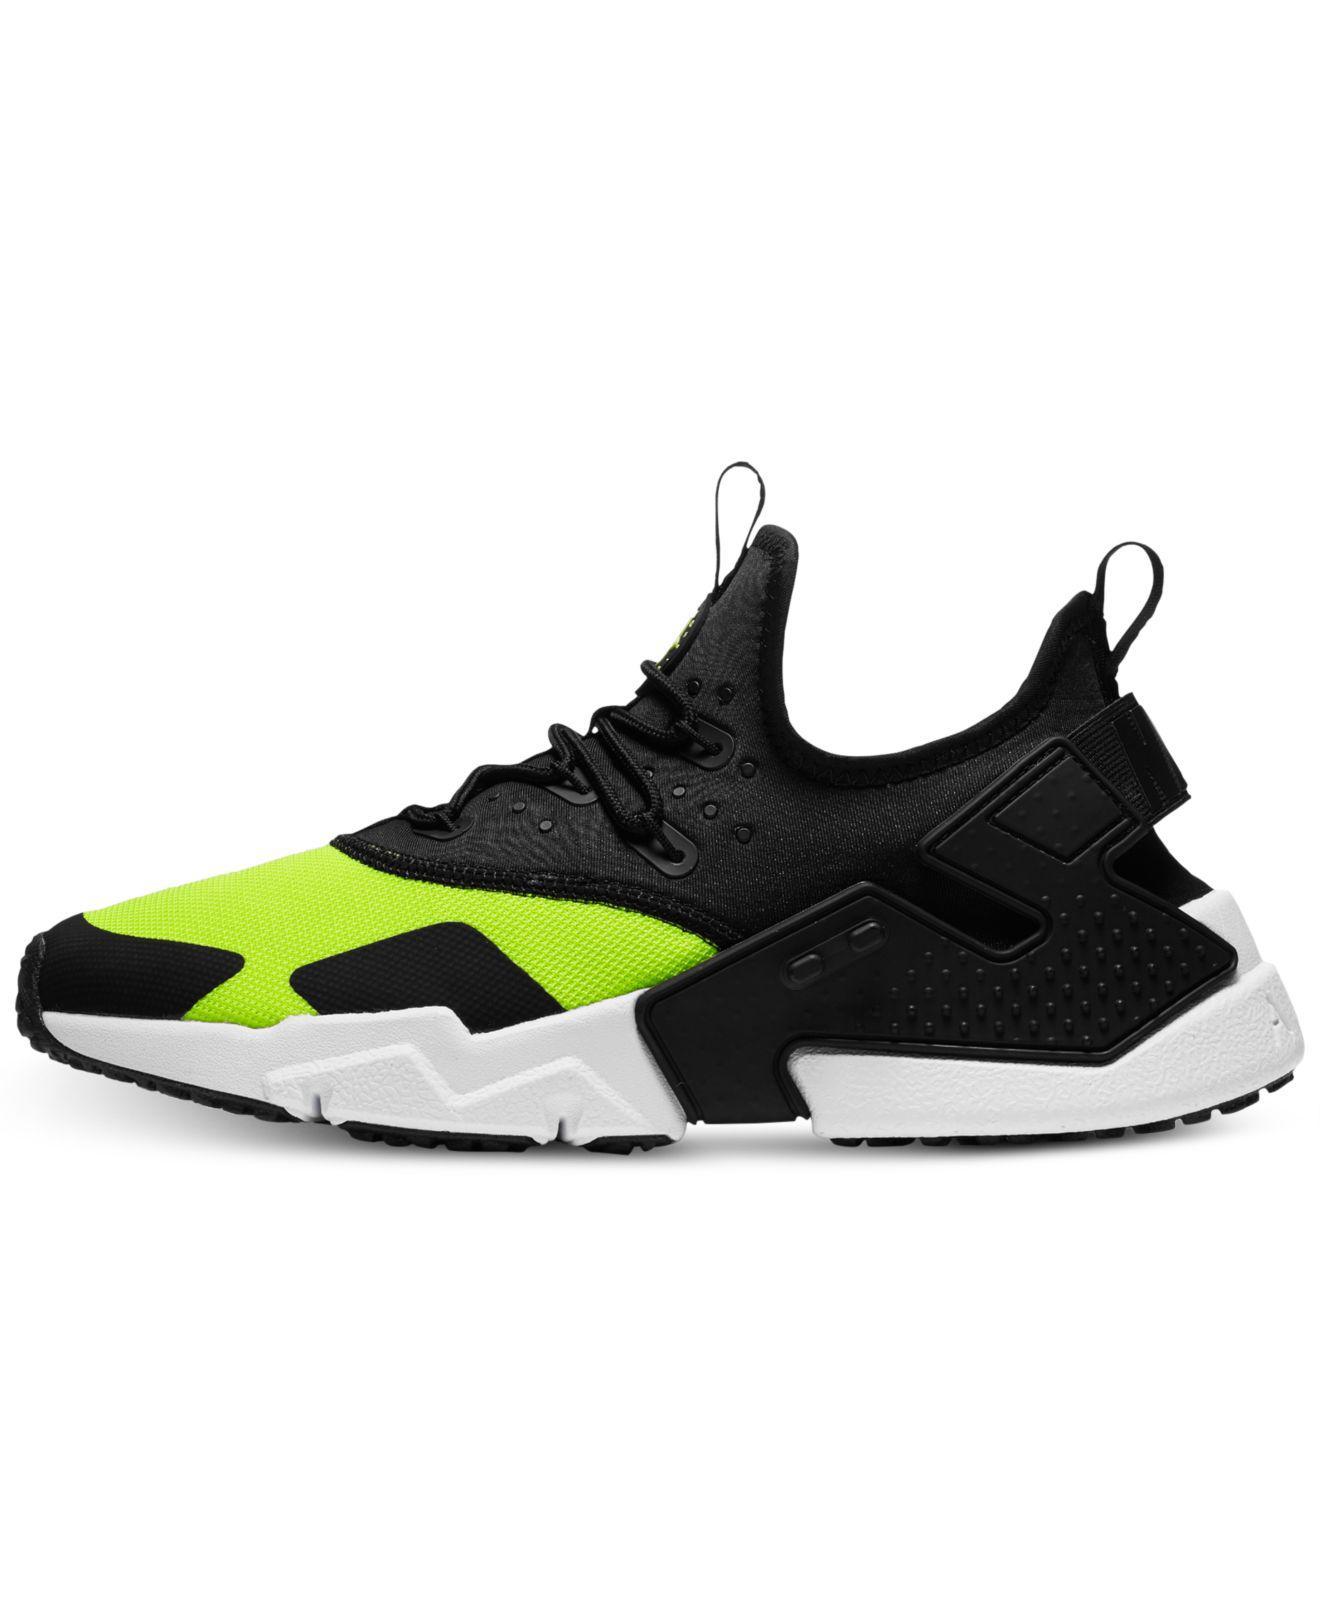 9db25d8d0b926 ... spain lyst nike air huarache run drift casual sneakers from finish line  in black for men